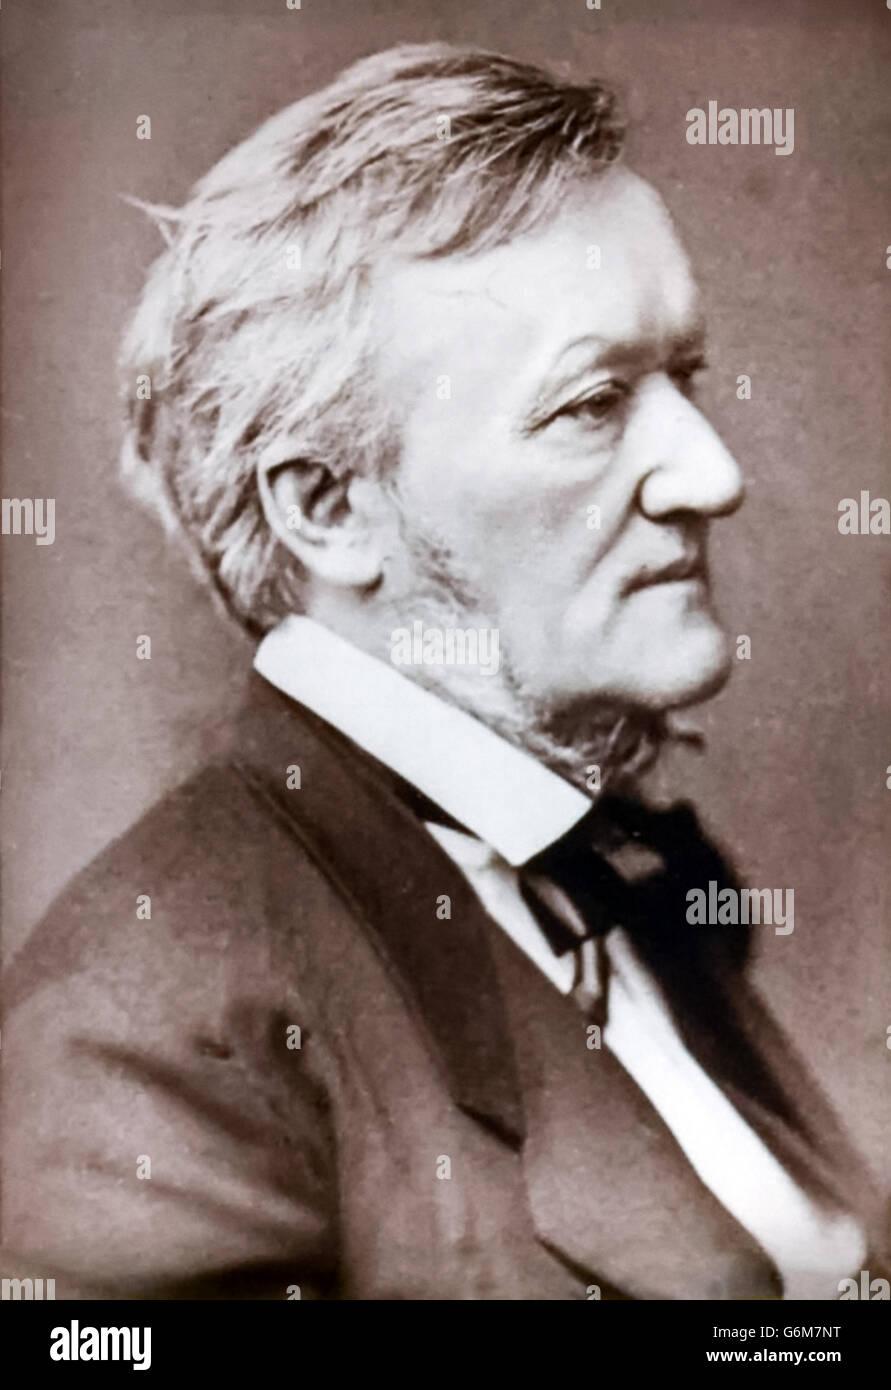 Richard Wagner (1813-1883) German composer, studio photograph circa 1873. Stock Photo